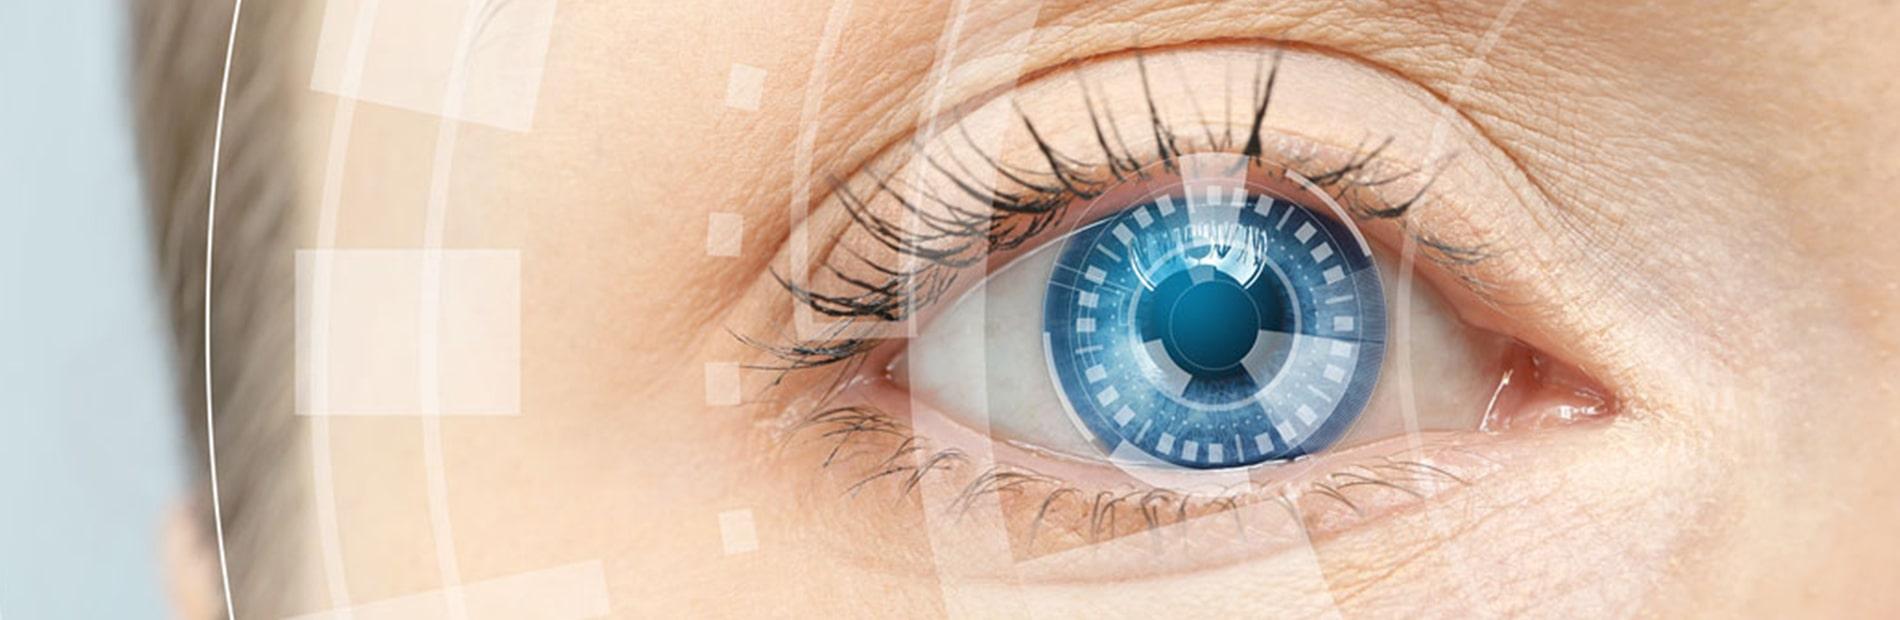 lensescosmetic_1-min